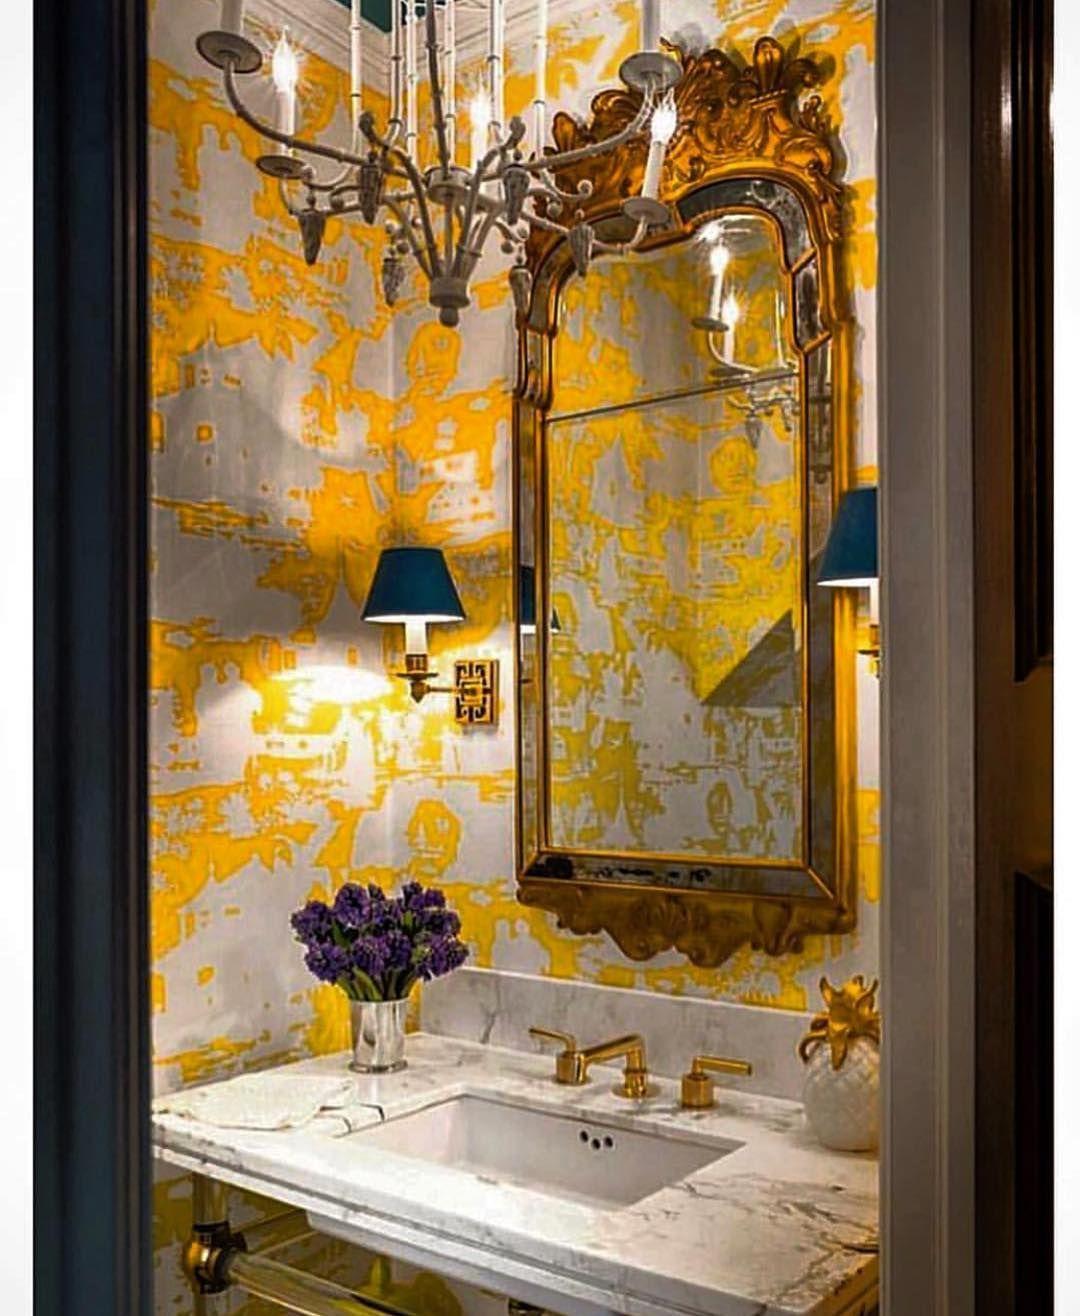 Scheffer Interiors Objetsd Art On Instagram Powder Room By Michael Maher Design Powderroom Powder Room Design Powder Room Wallpaper Relaxing Bathroom